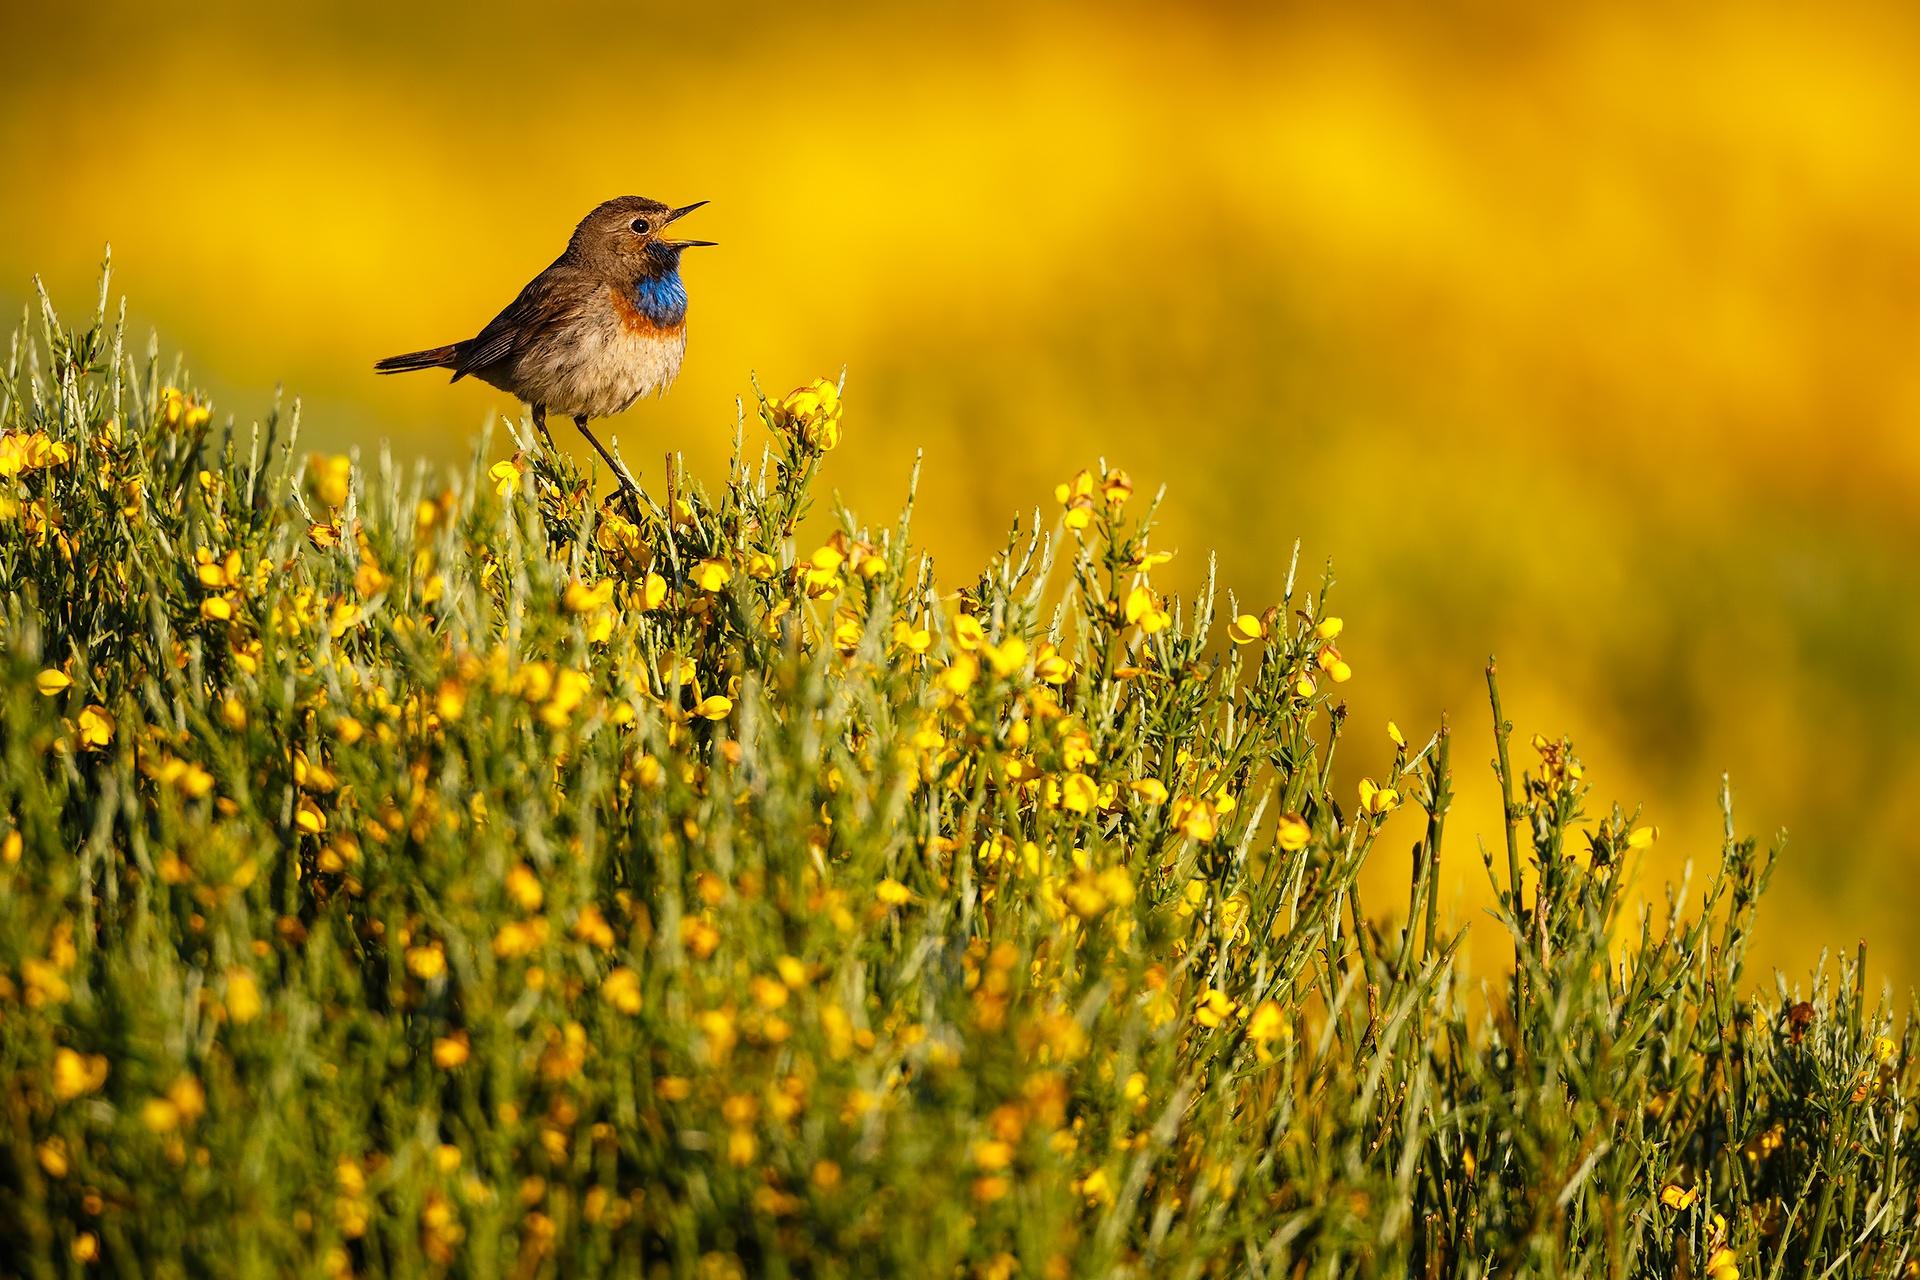 Canto de primavera - Mario Suarez - Portfolio Natural, Fotografía de Naturaleza de Autor